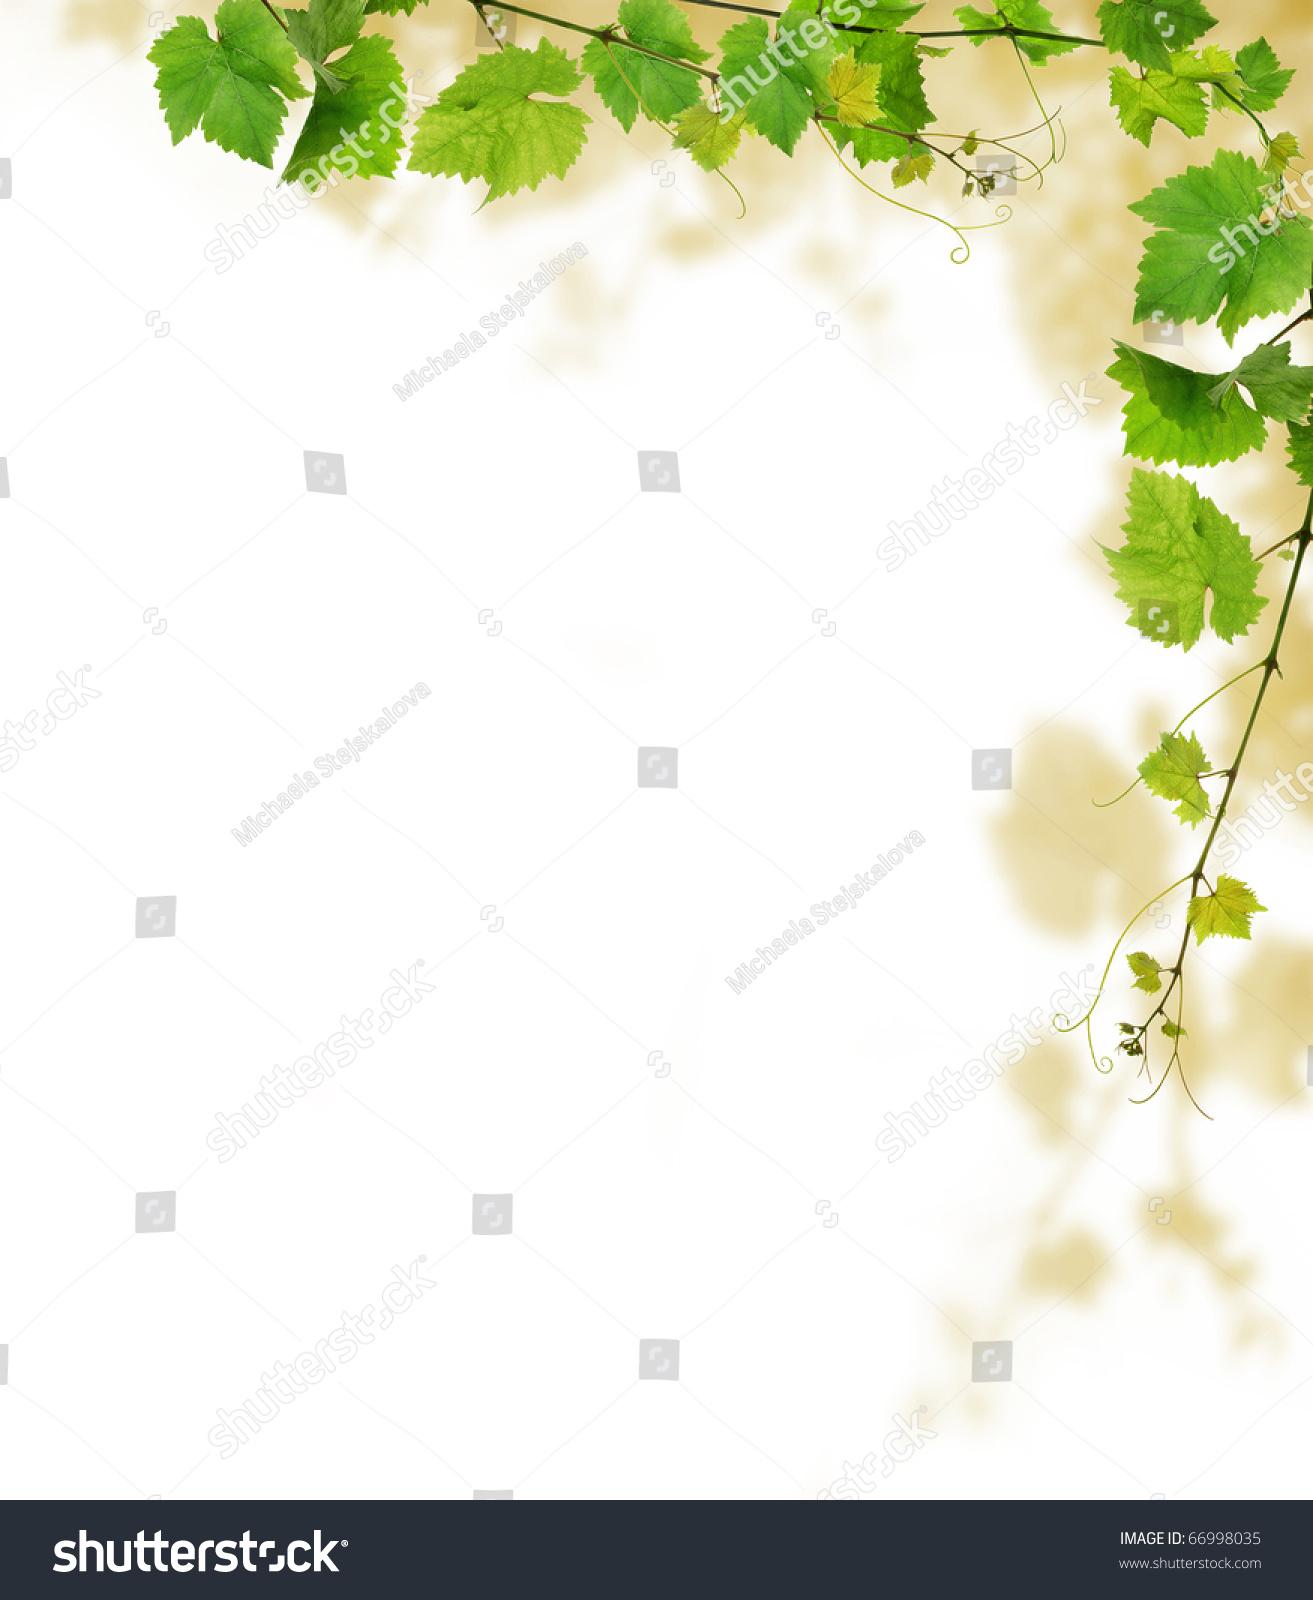 grapevine border design on white background stock photo